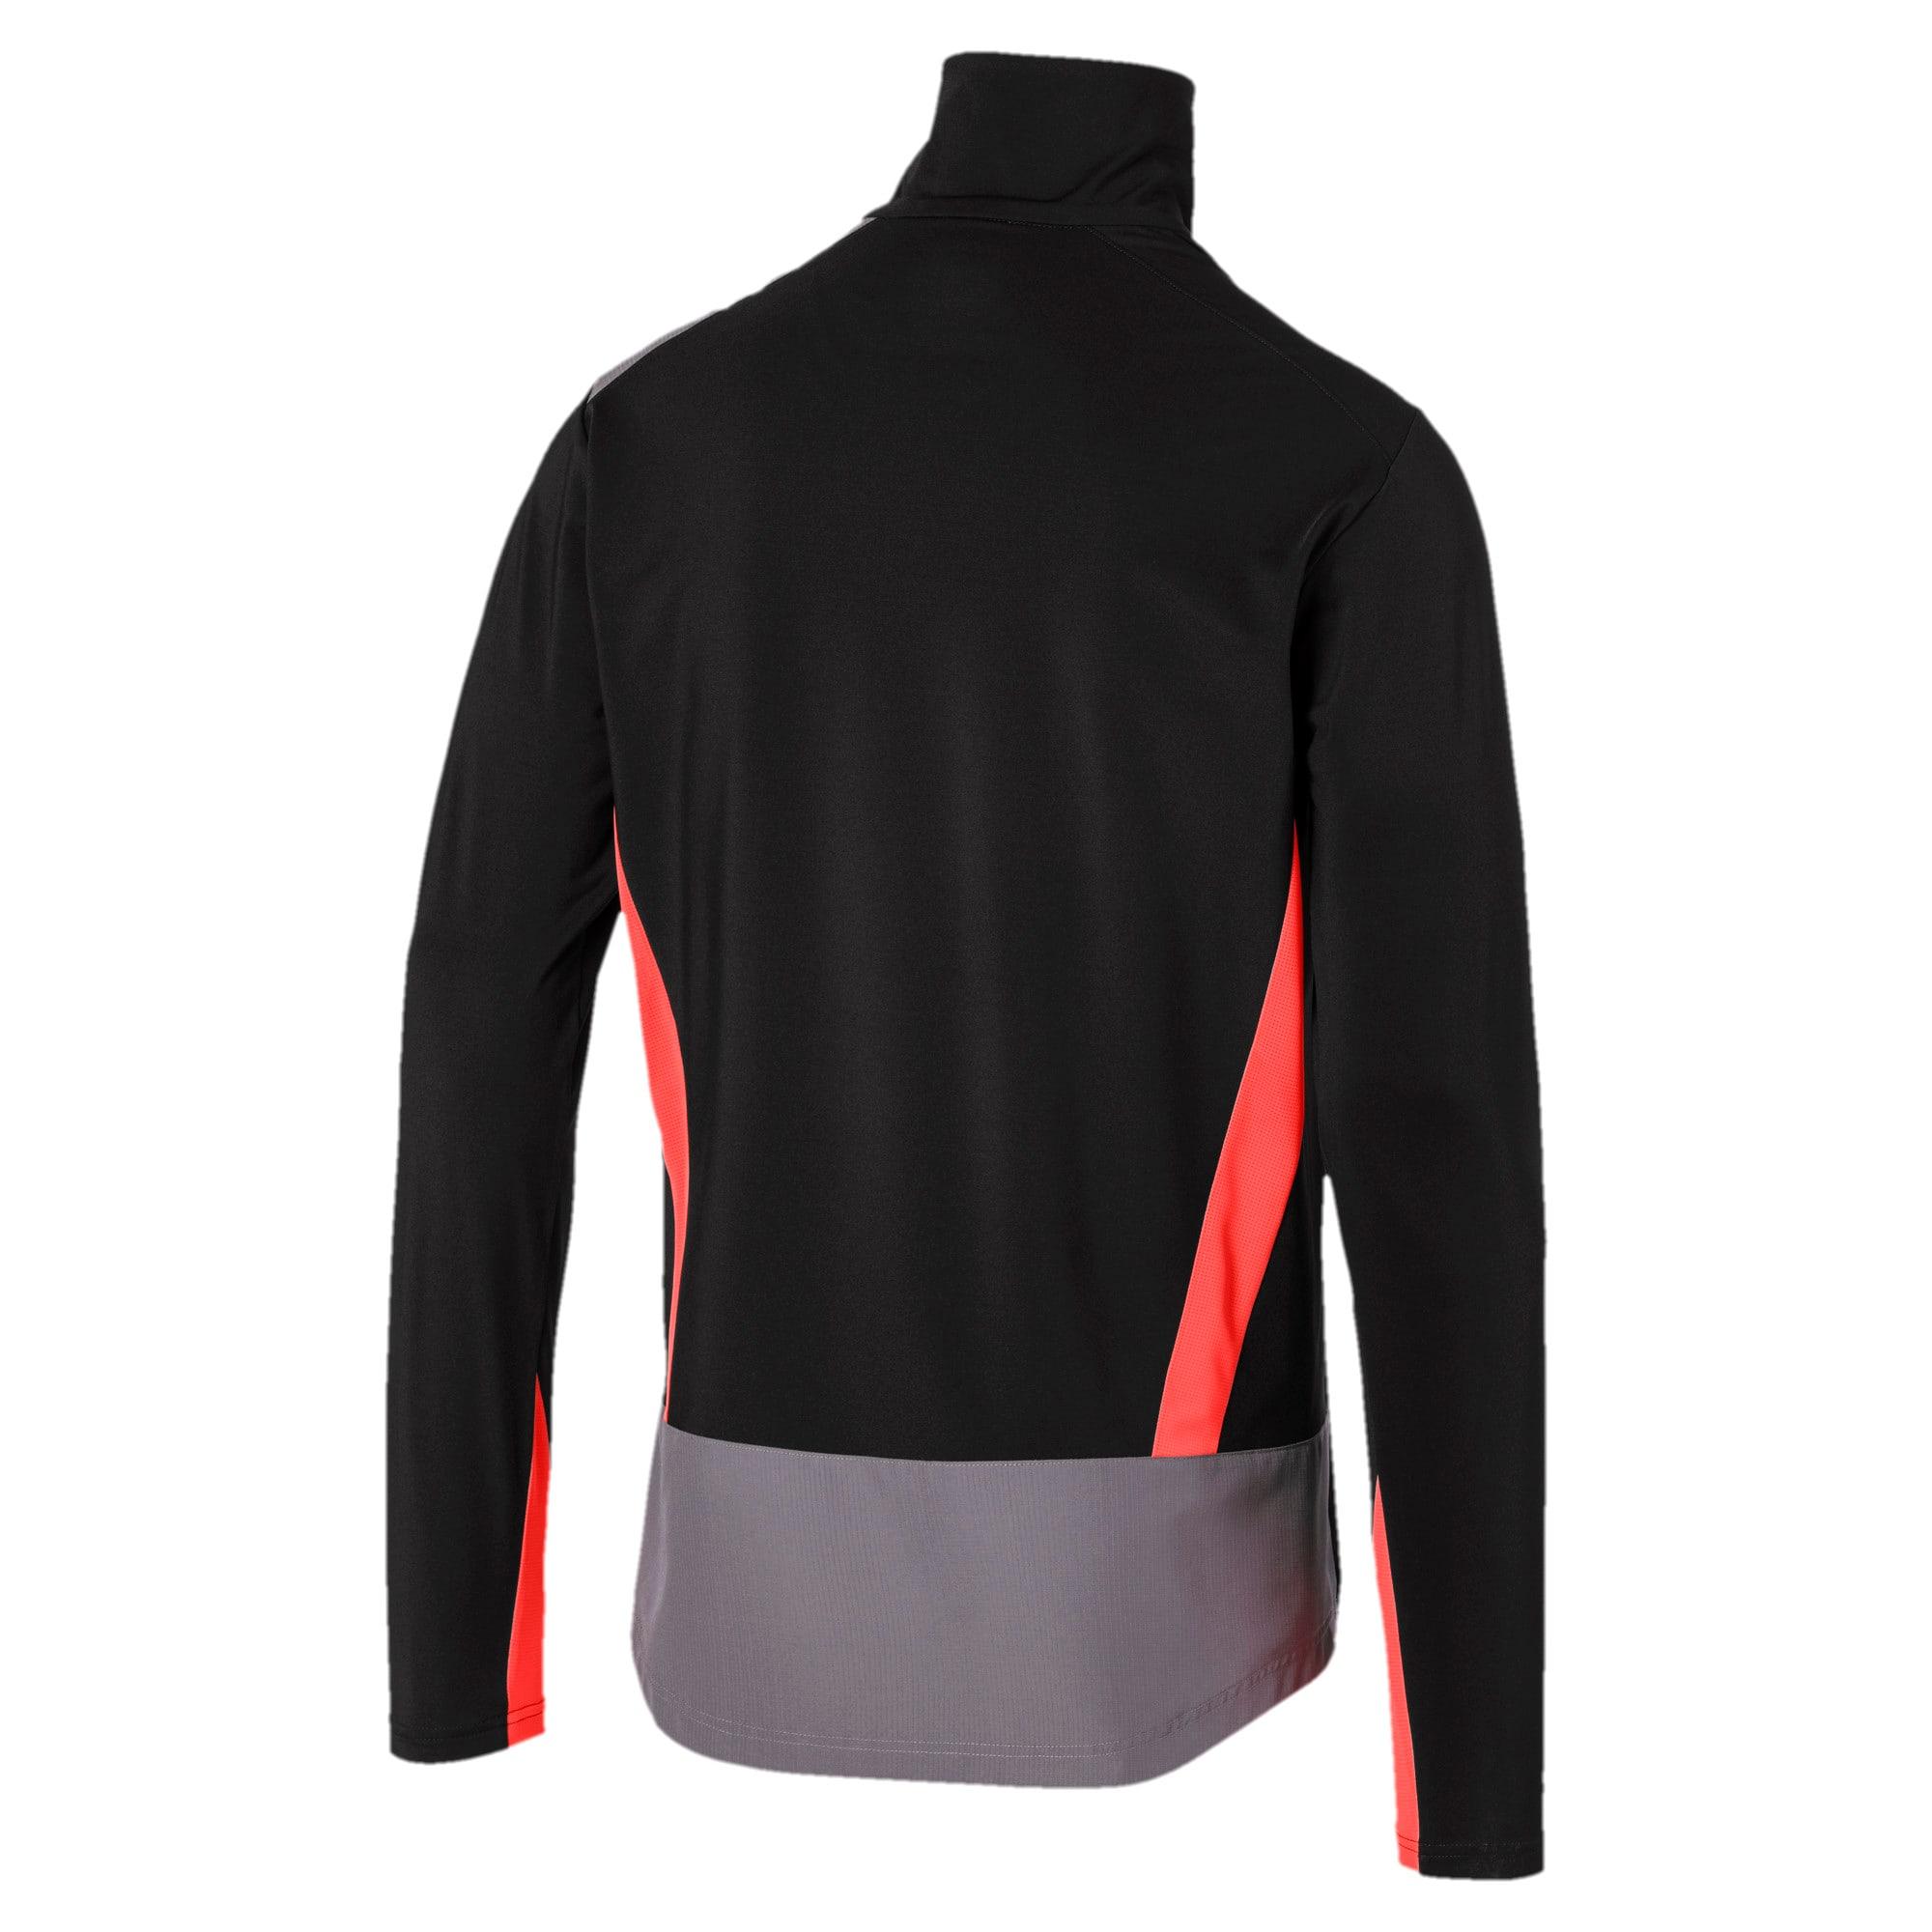 Thumbnail 5 of ftblNXT Quarter Zip Men's Top, Puma Black-Nrgy Red, medium